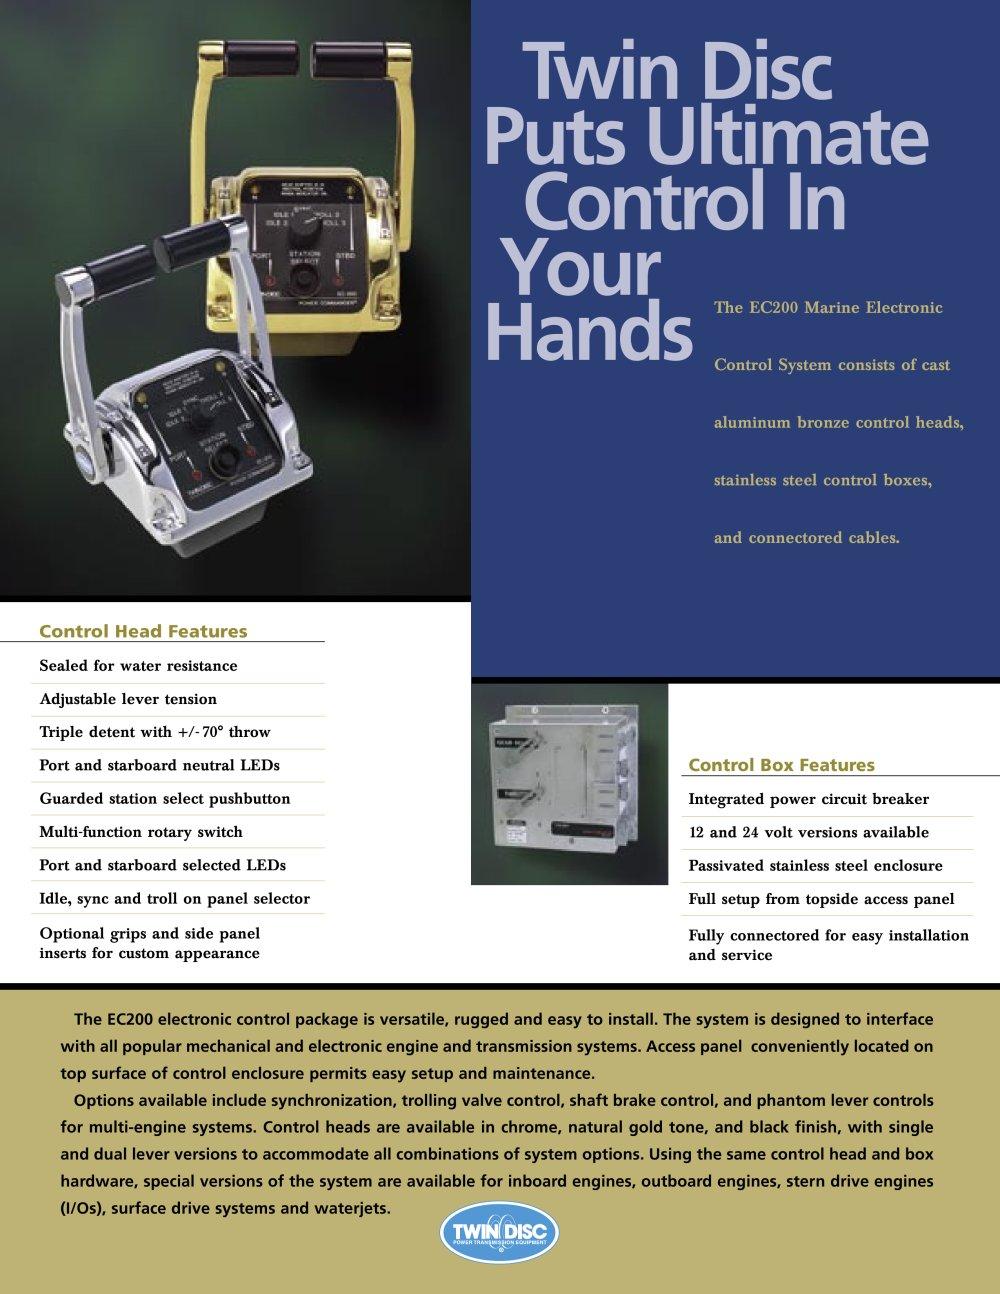 twin disc ec200 electronic controls twin disc pdf catalogue rh pdf directindustry com twin disc ec300 installation manual twin disc ec300 operator's manual